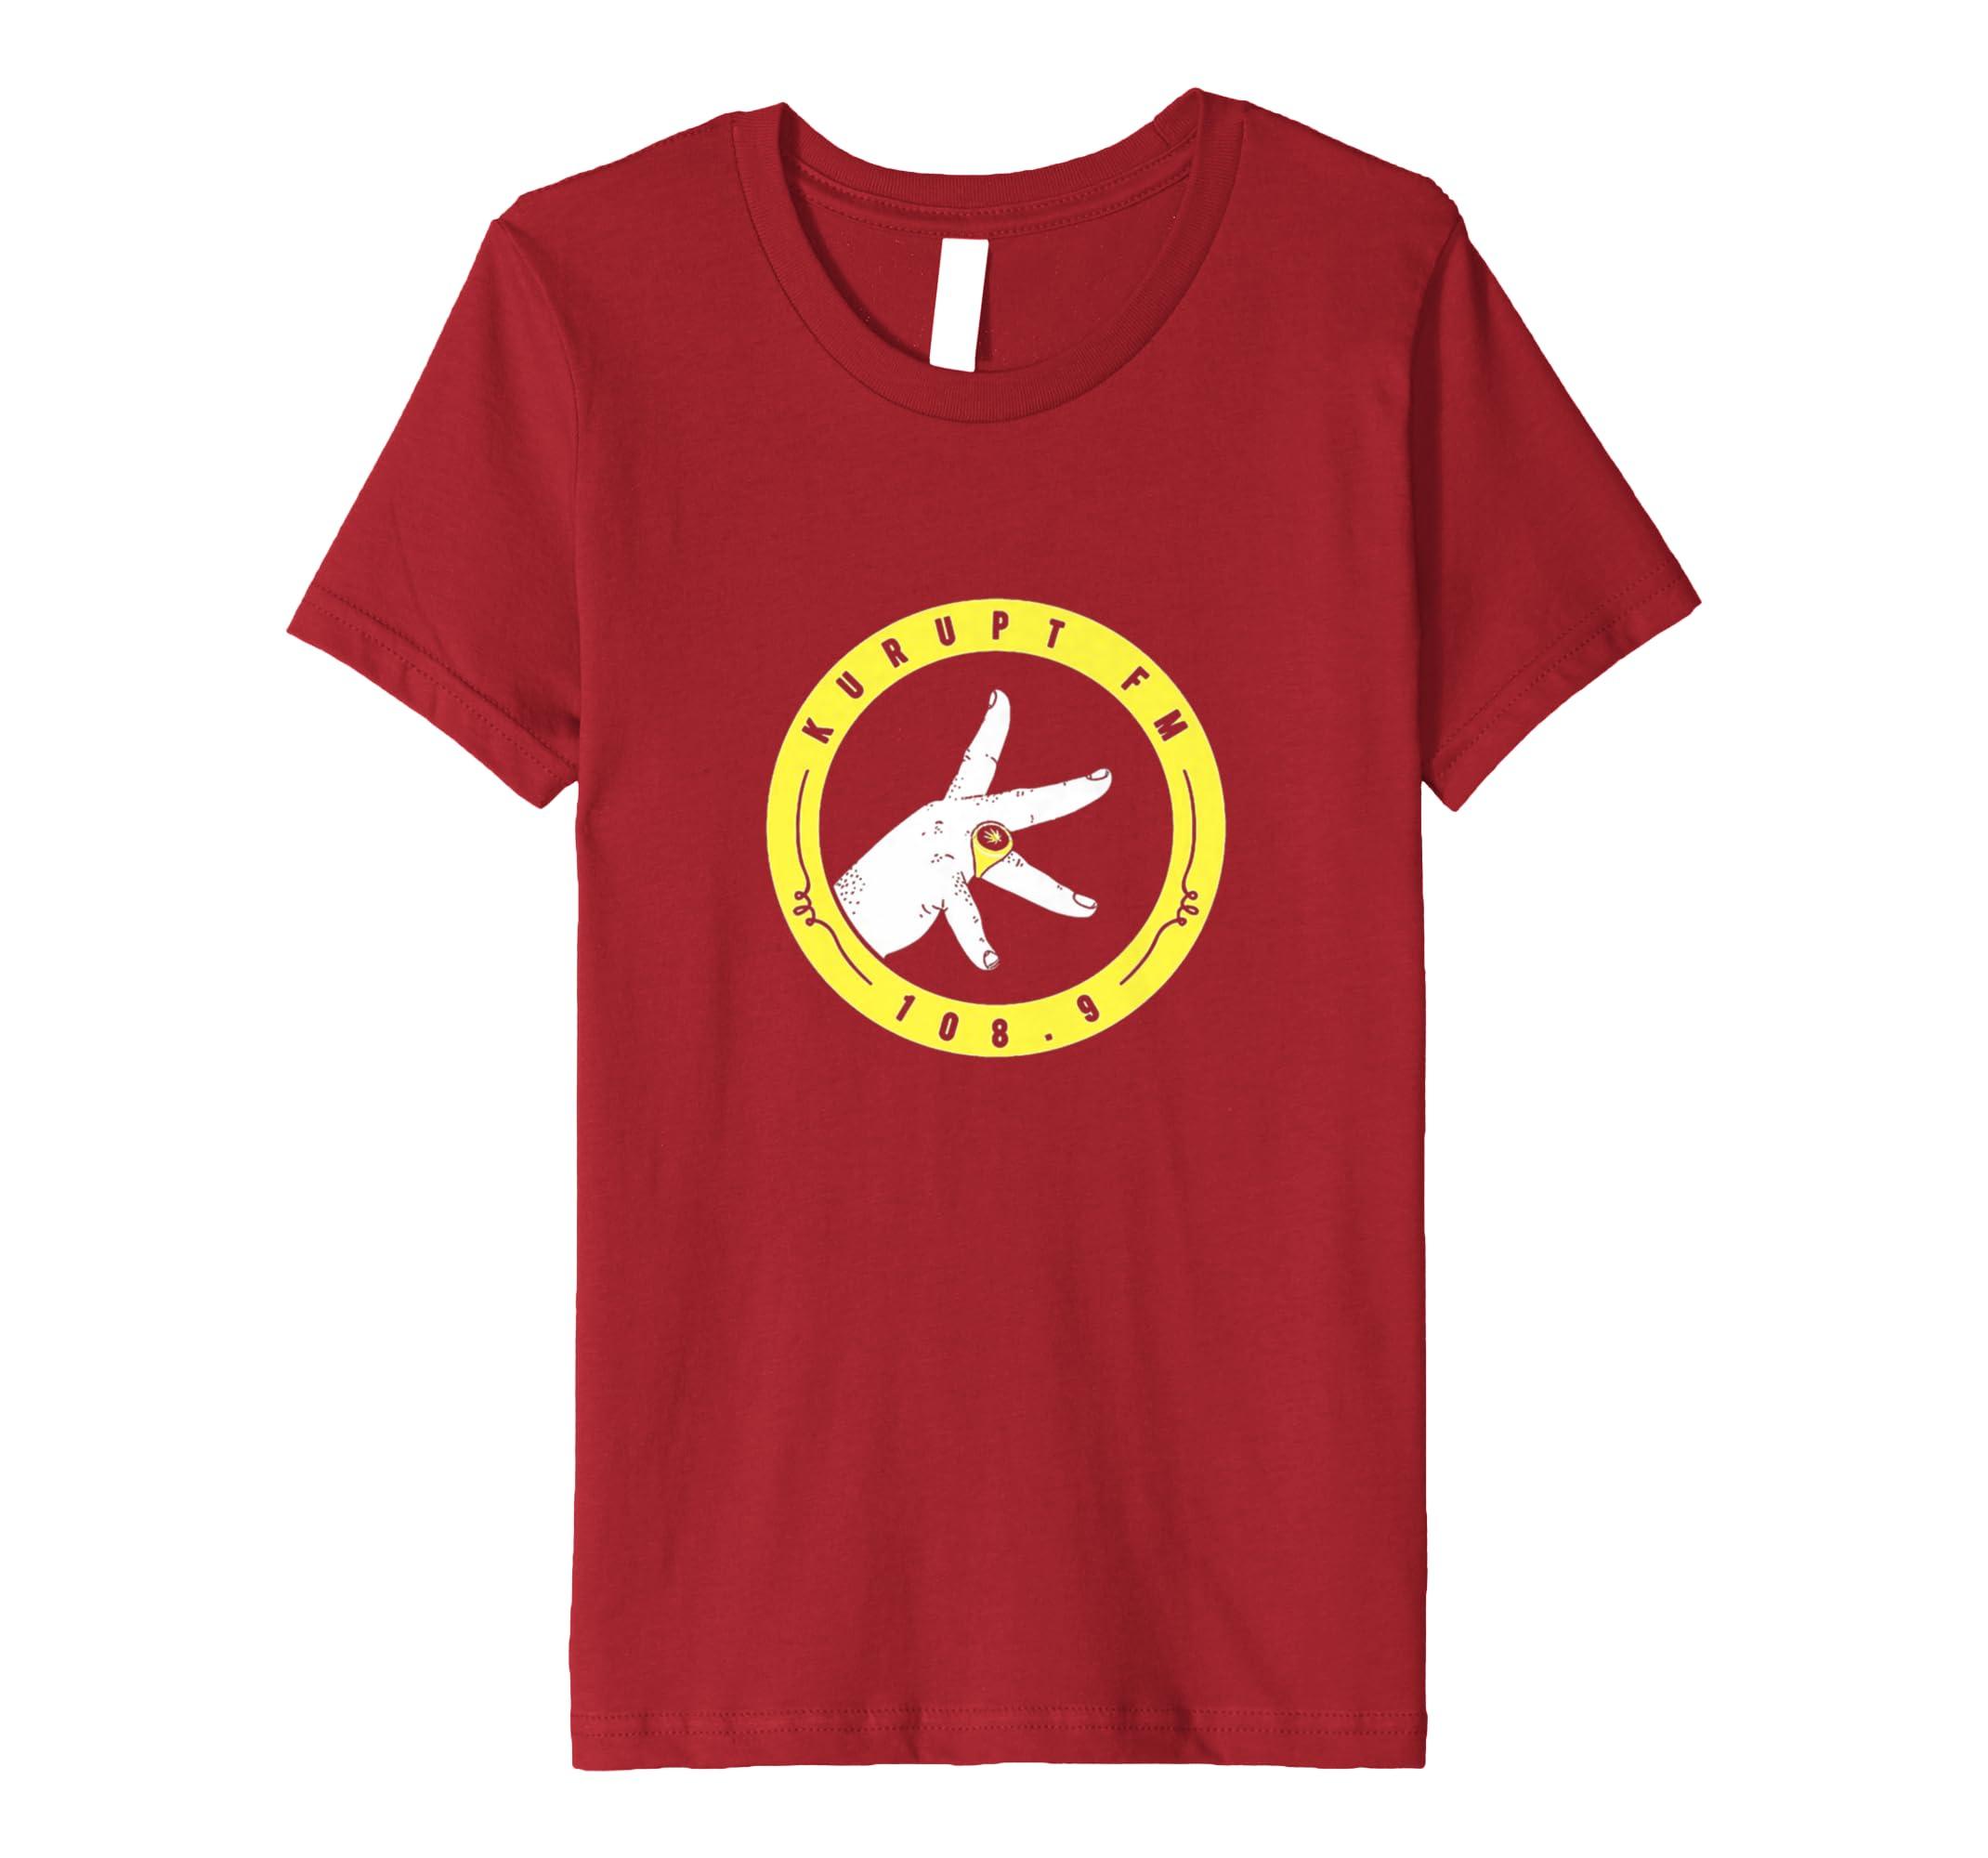 97f0434547d0 Amazon.com: Kurupt 108.9 FM Tee Shirt: Clothing